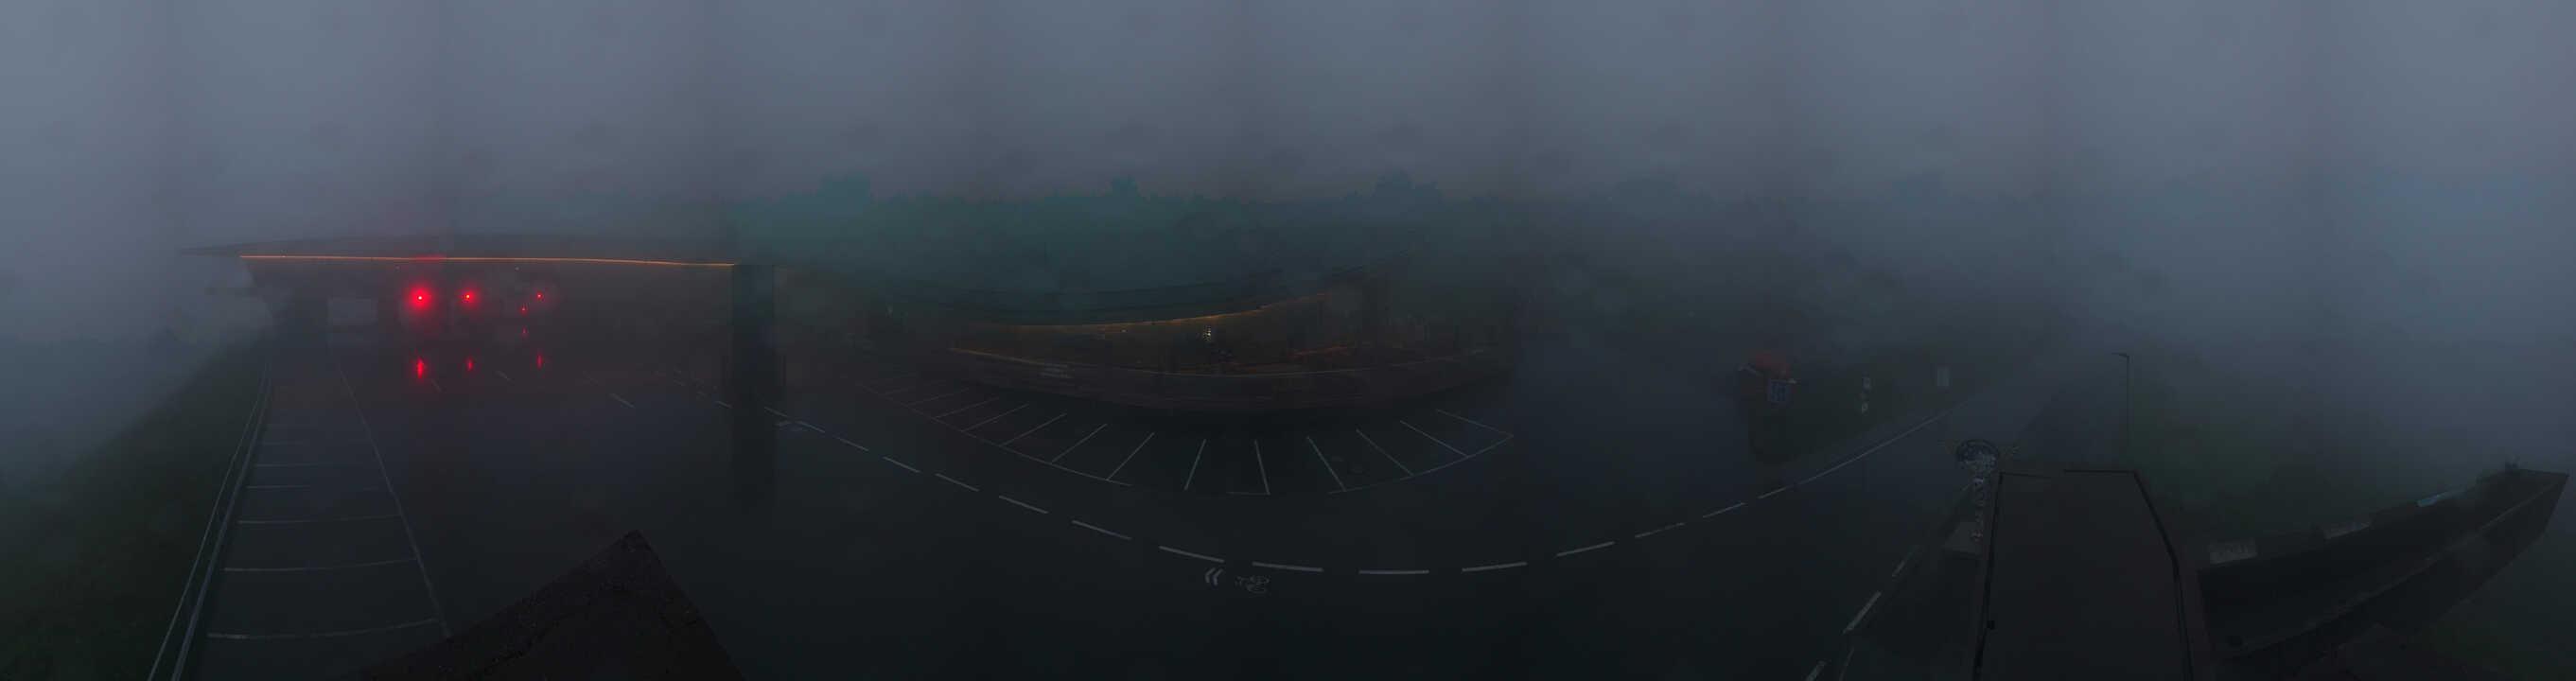 HD Panoramawebcam Hochgurgl mit Mautstelle Timmelsjoch Passtrasse und Talstation Kirchenkar Lift (rechts)